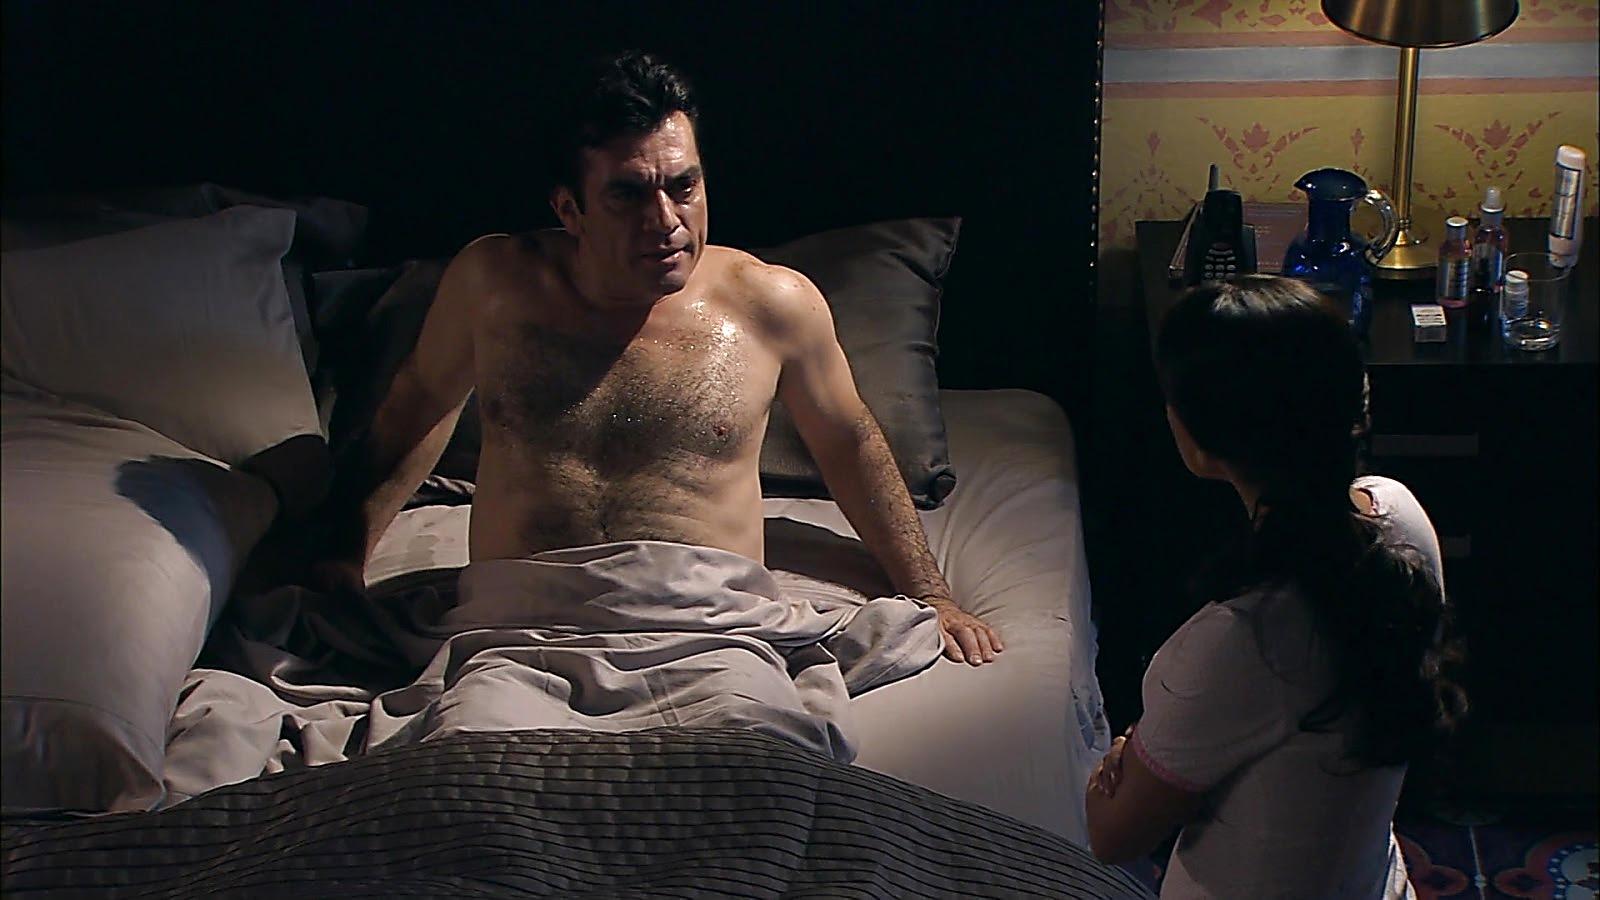 Jorge Salinas sexy shirtless scene February 5, 2020, 6am